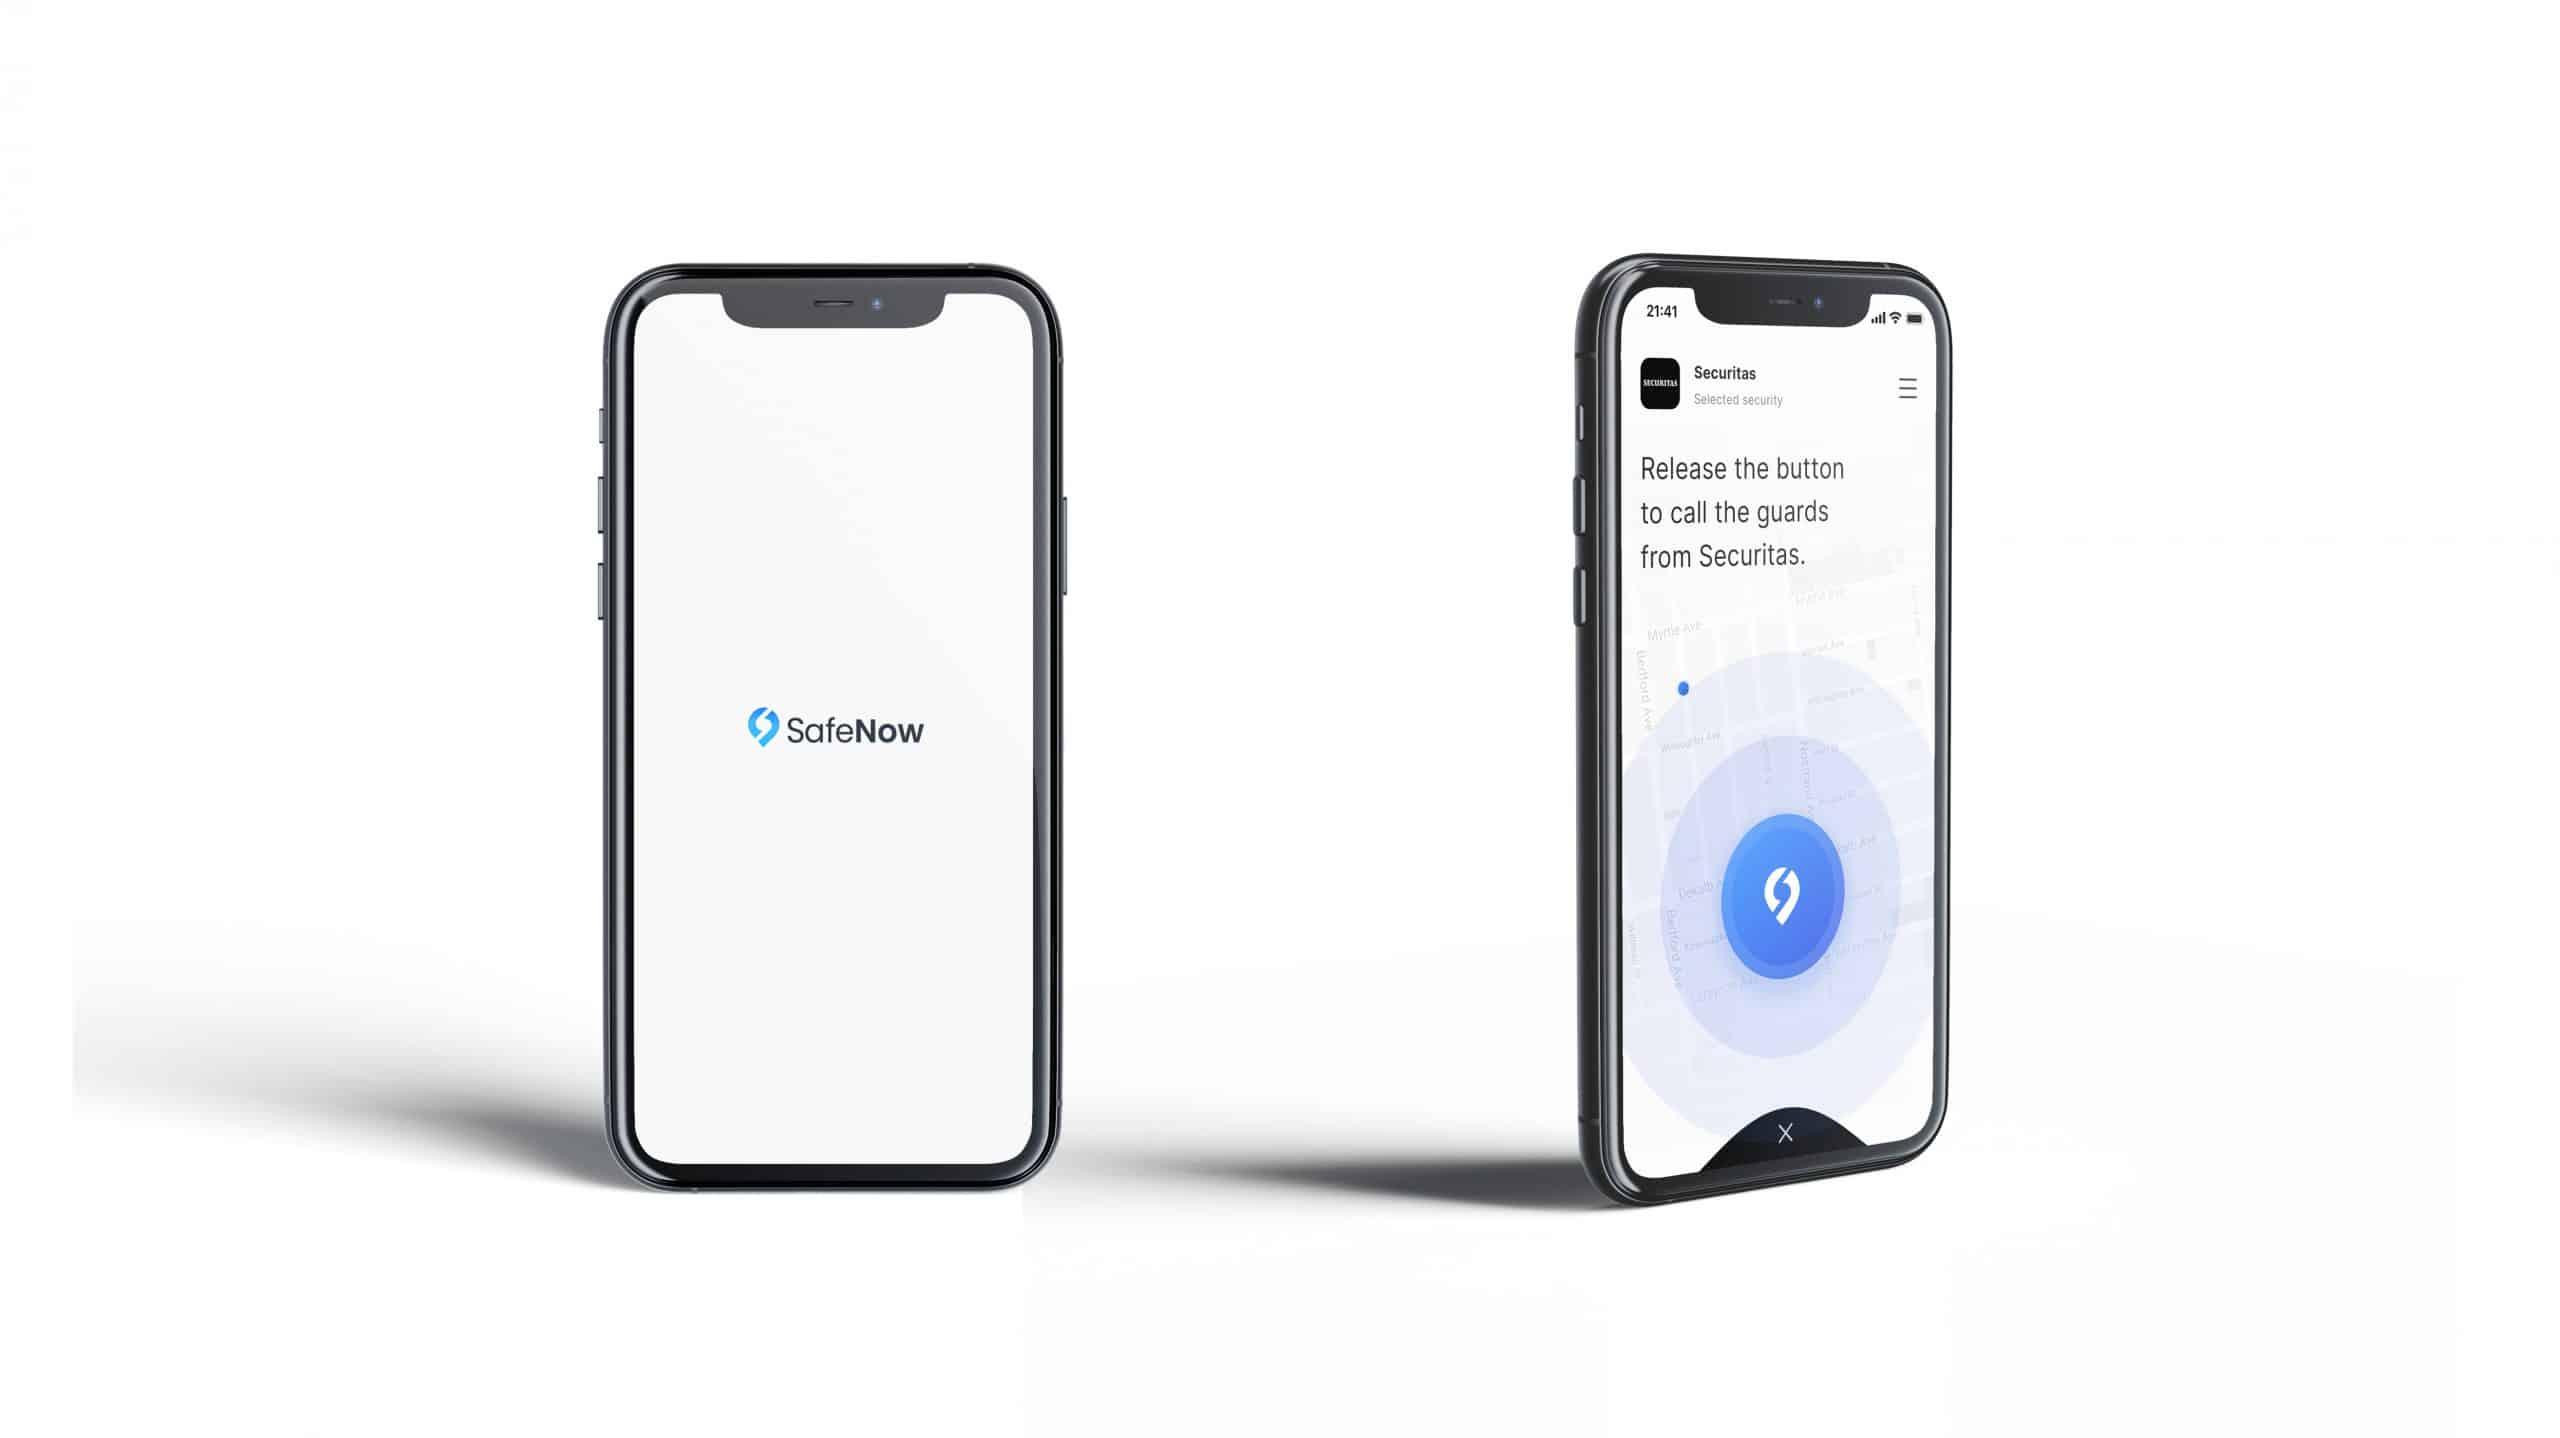 SafeNow Screen Design, Start-Up Pitchdeck